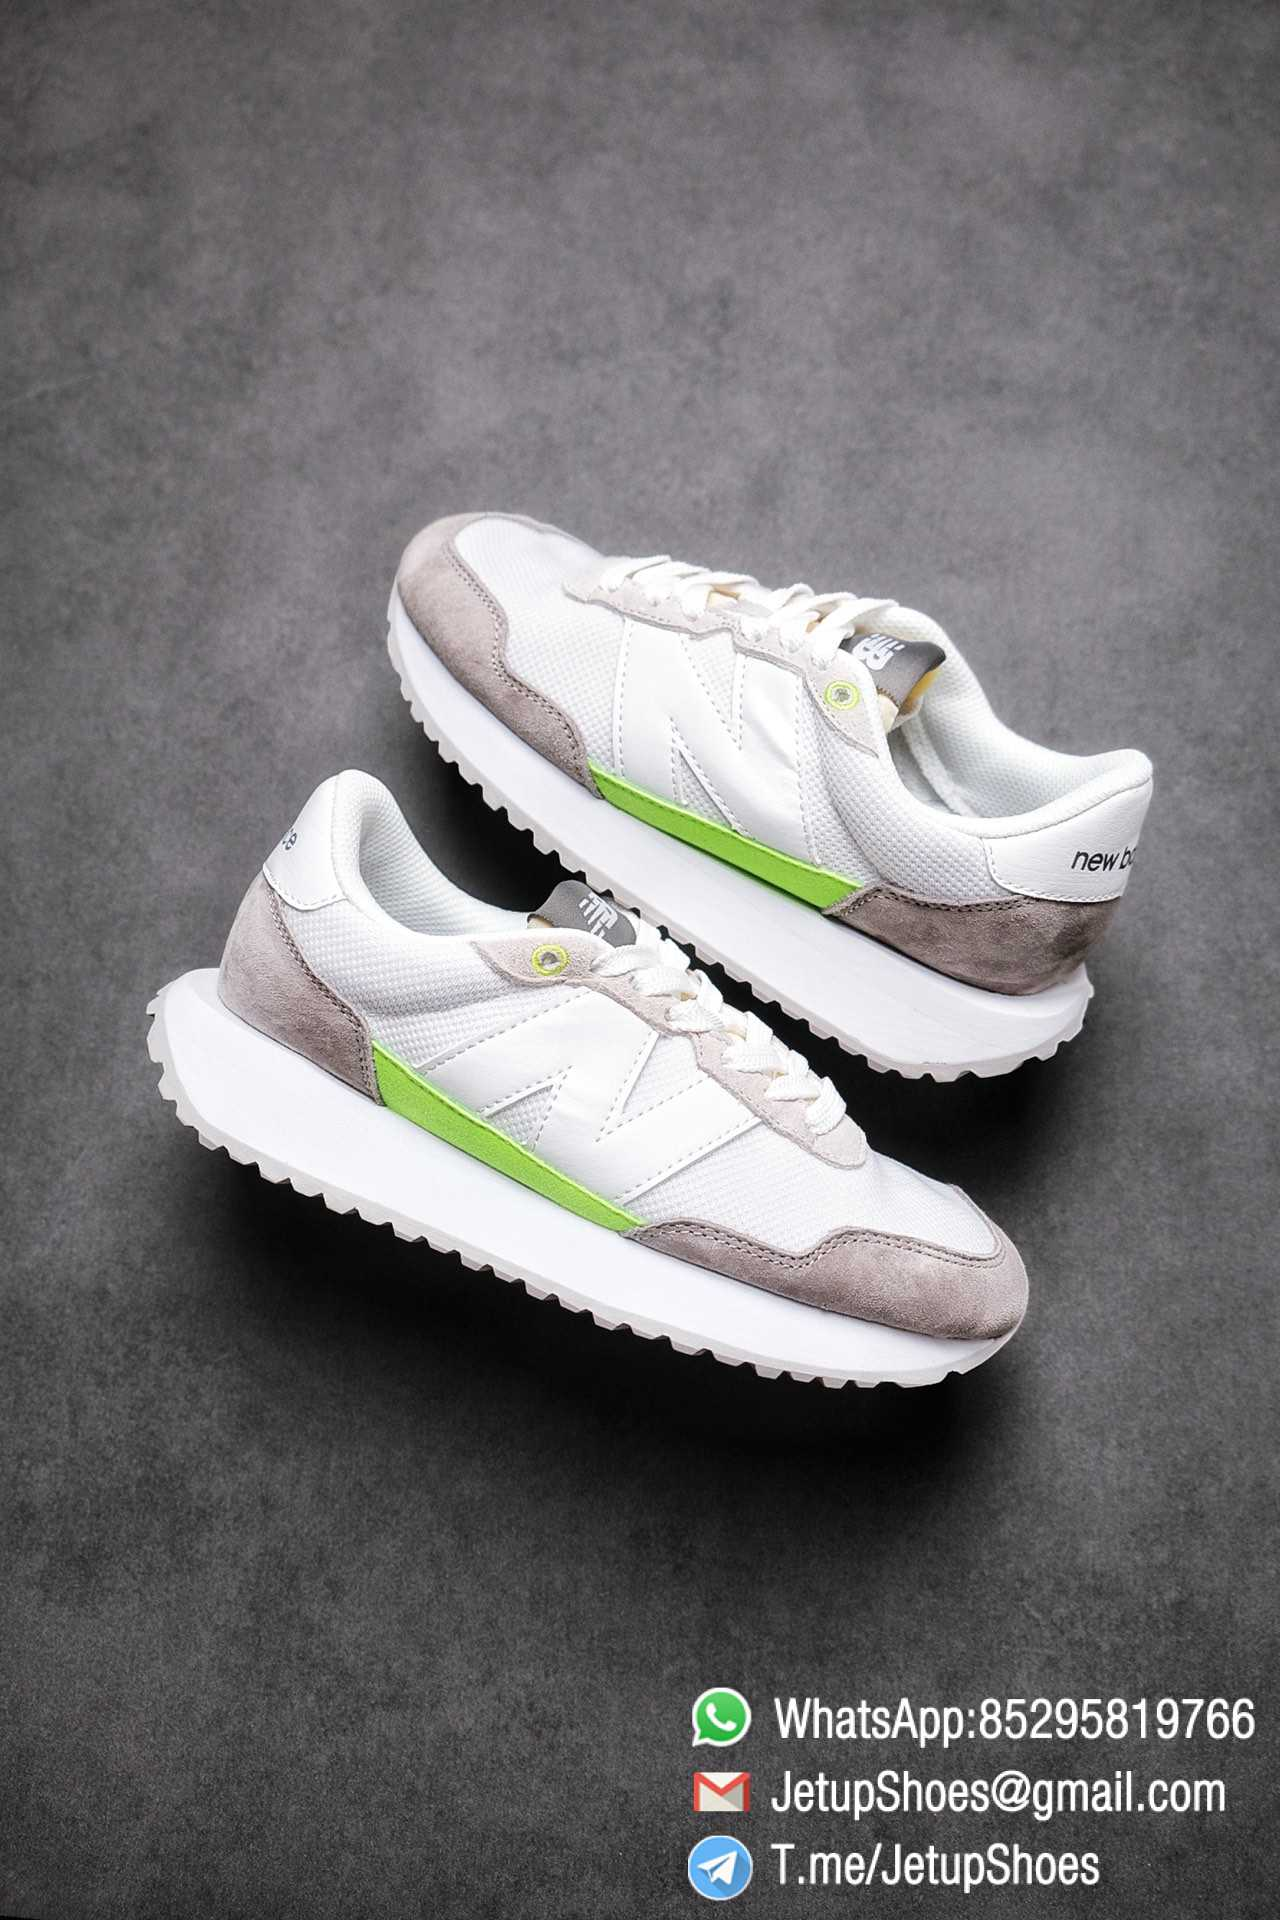 Best Replica New Balance 237 Niko x 237 Grey Green SKU MS237SL1 High Quality Fake Sneakers 01